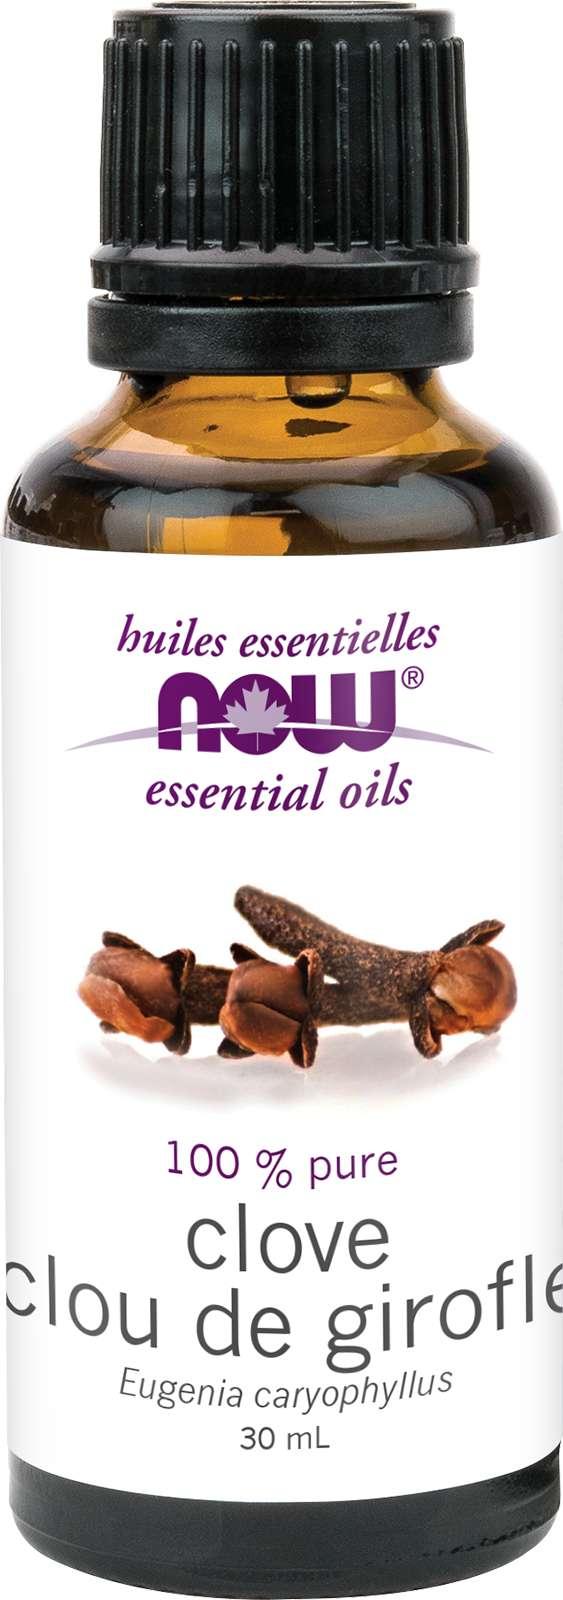 Clove Oil (Eugenia caryophyllus) 30mL